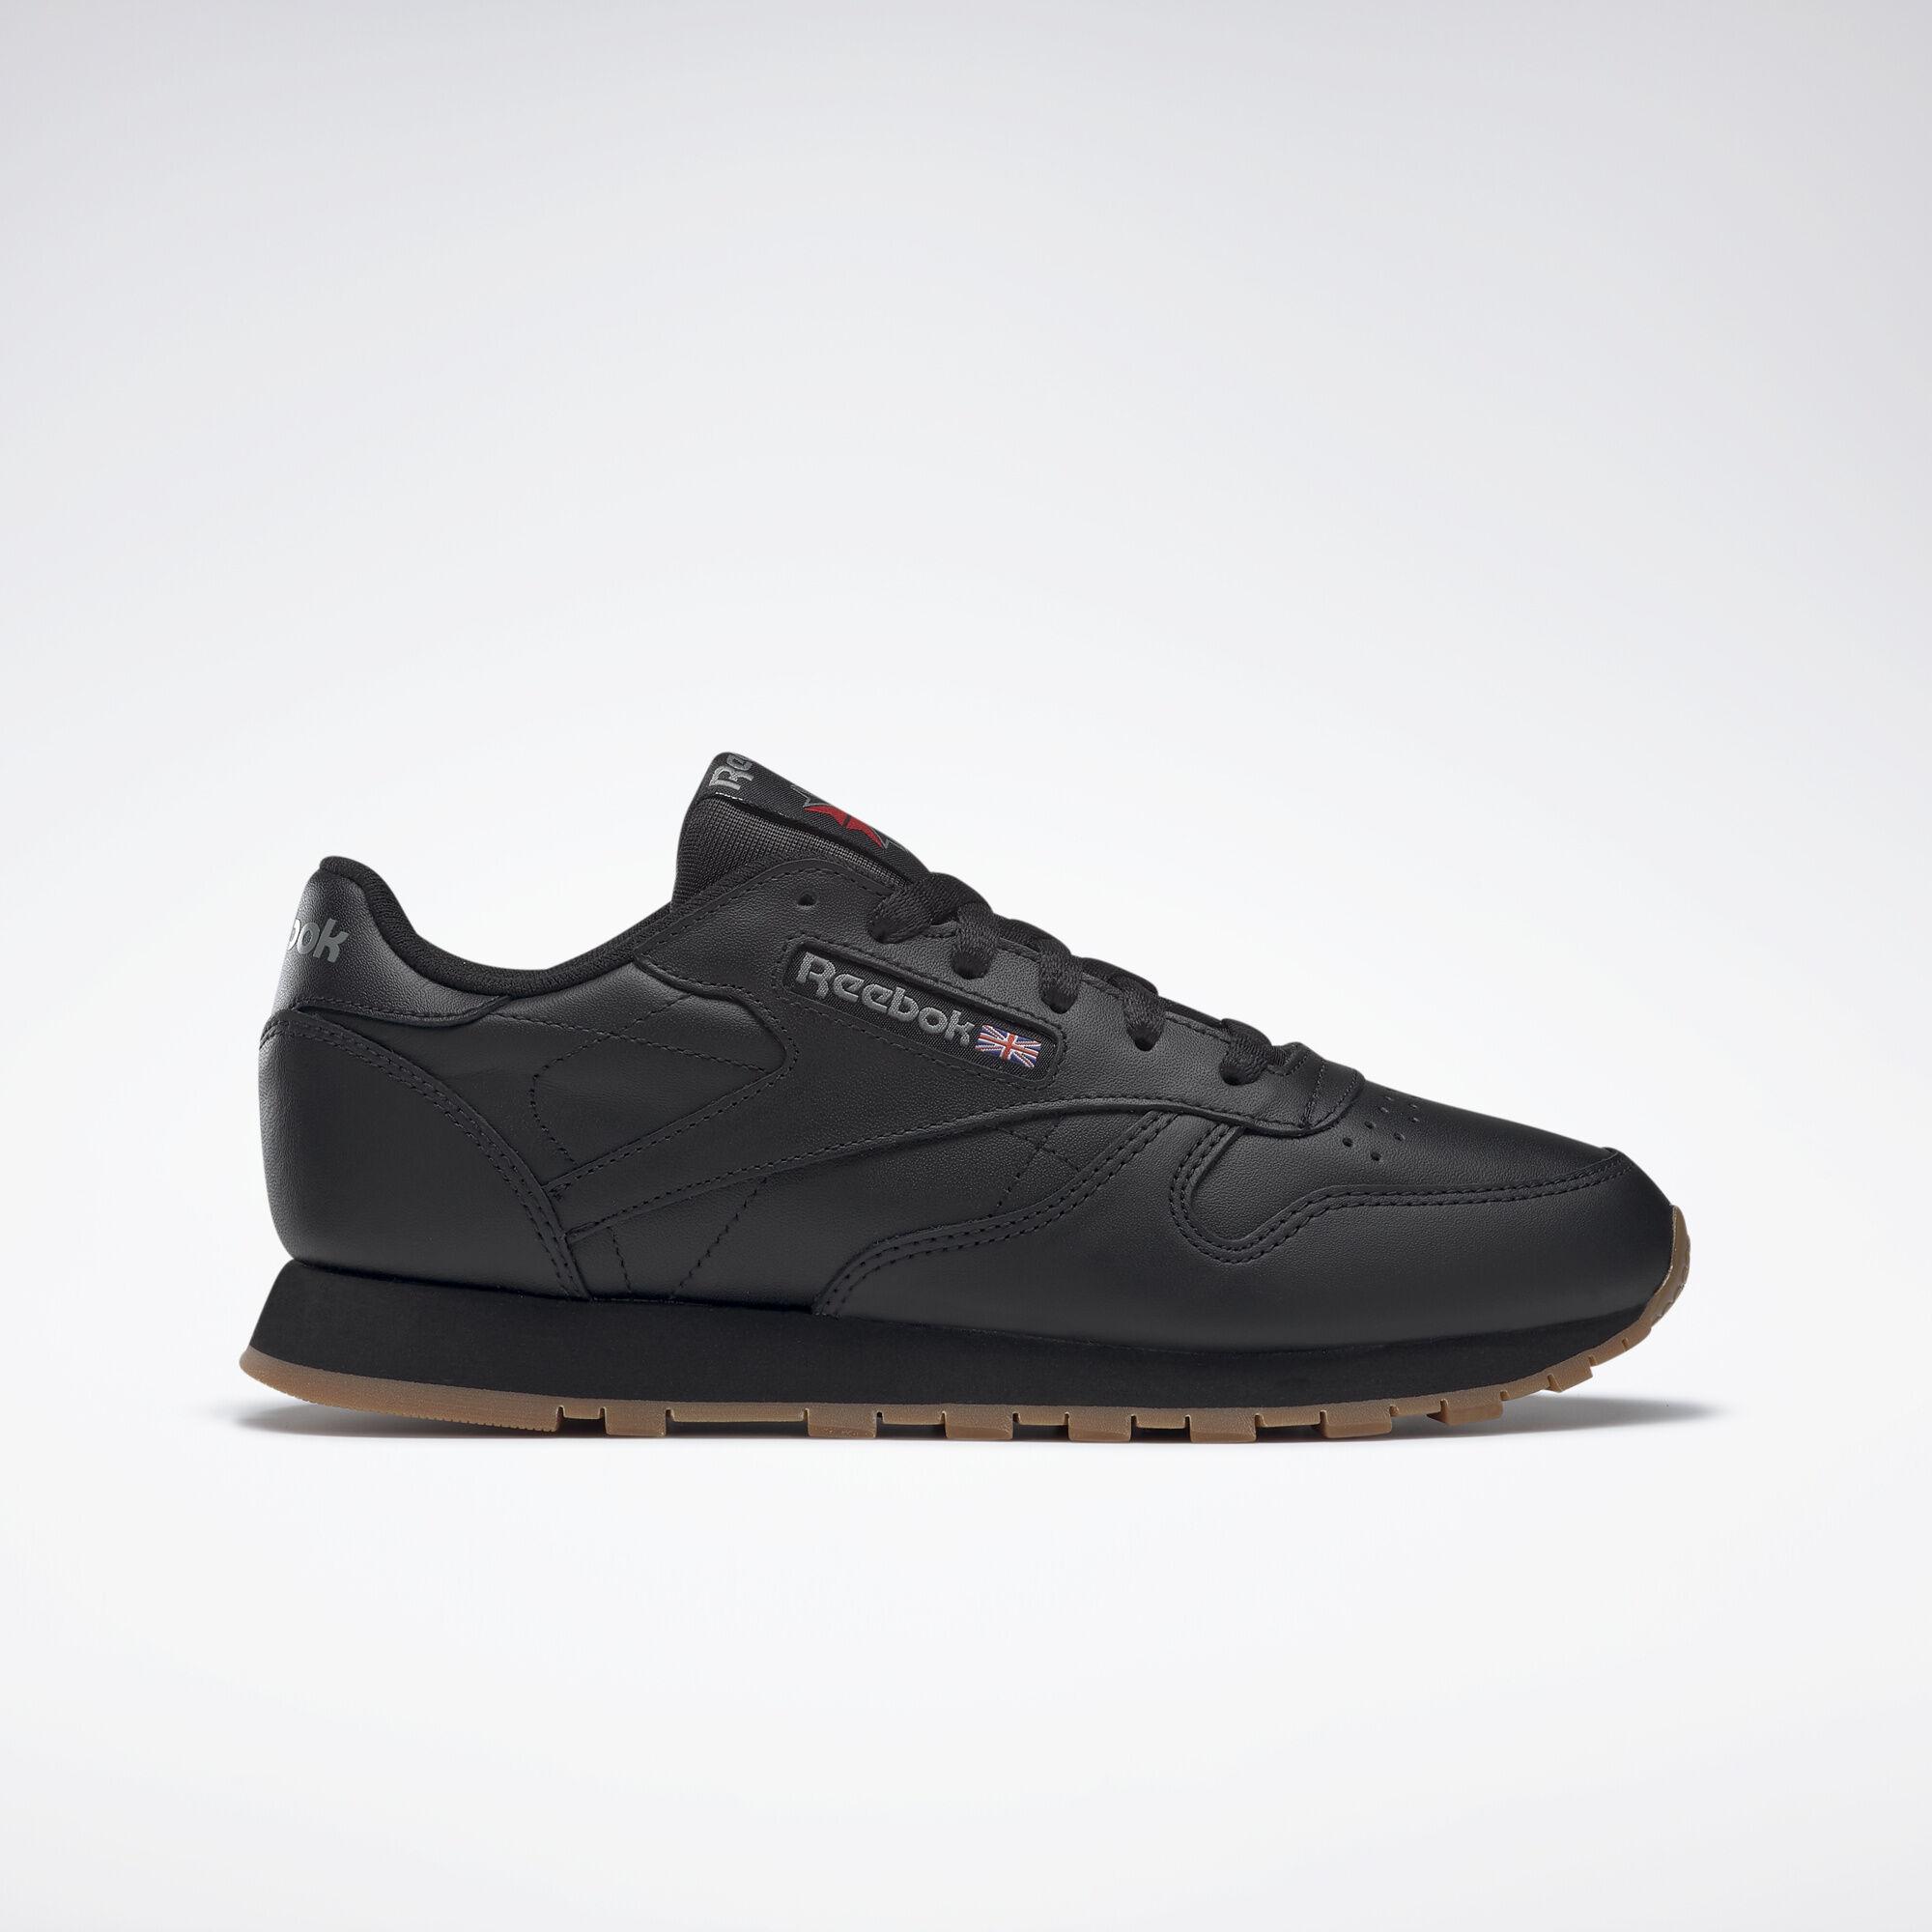 reebok classic leather black reebok mlt